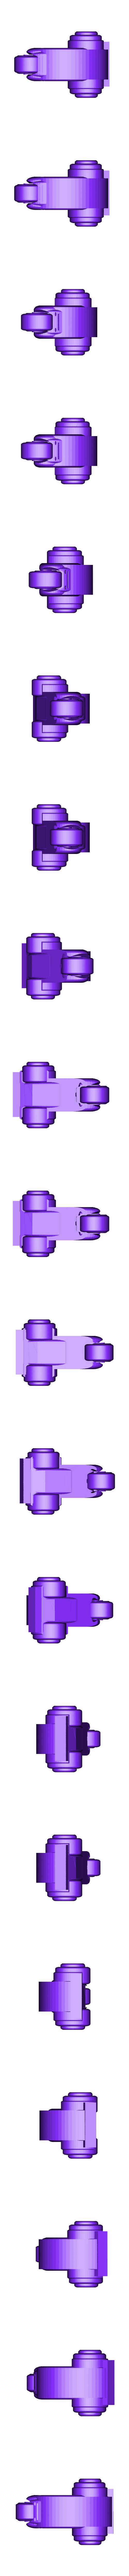 Simple Bike.stl Download STL file Serpent Big Boss with Commercial Option. • 3D printer model, TFG